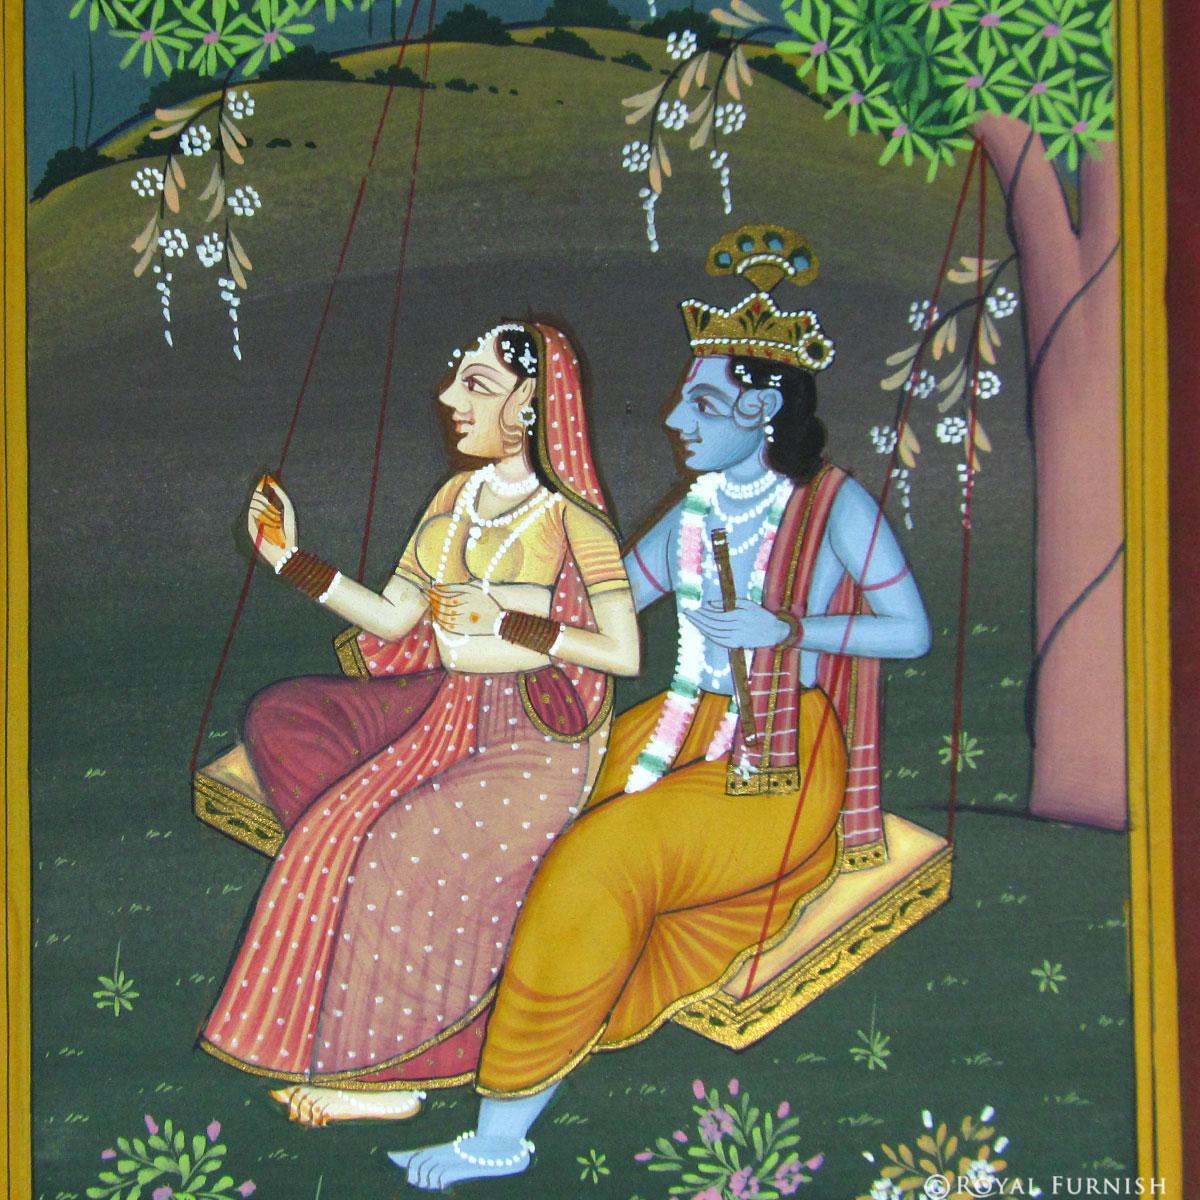 Alwar Girl Wallpaper Hindu Radha Krishna On Swing Rajasthani Miniature Wall Art